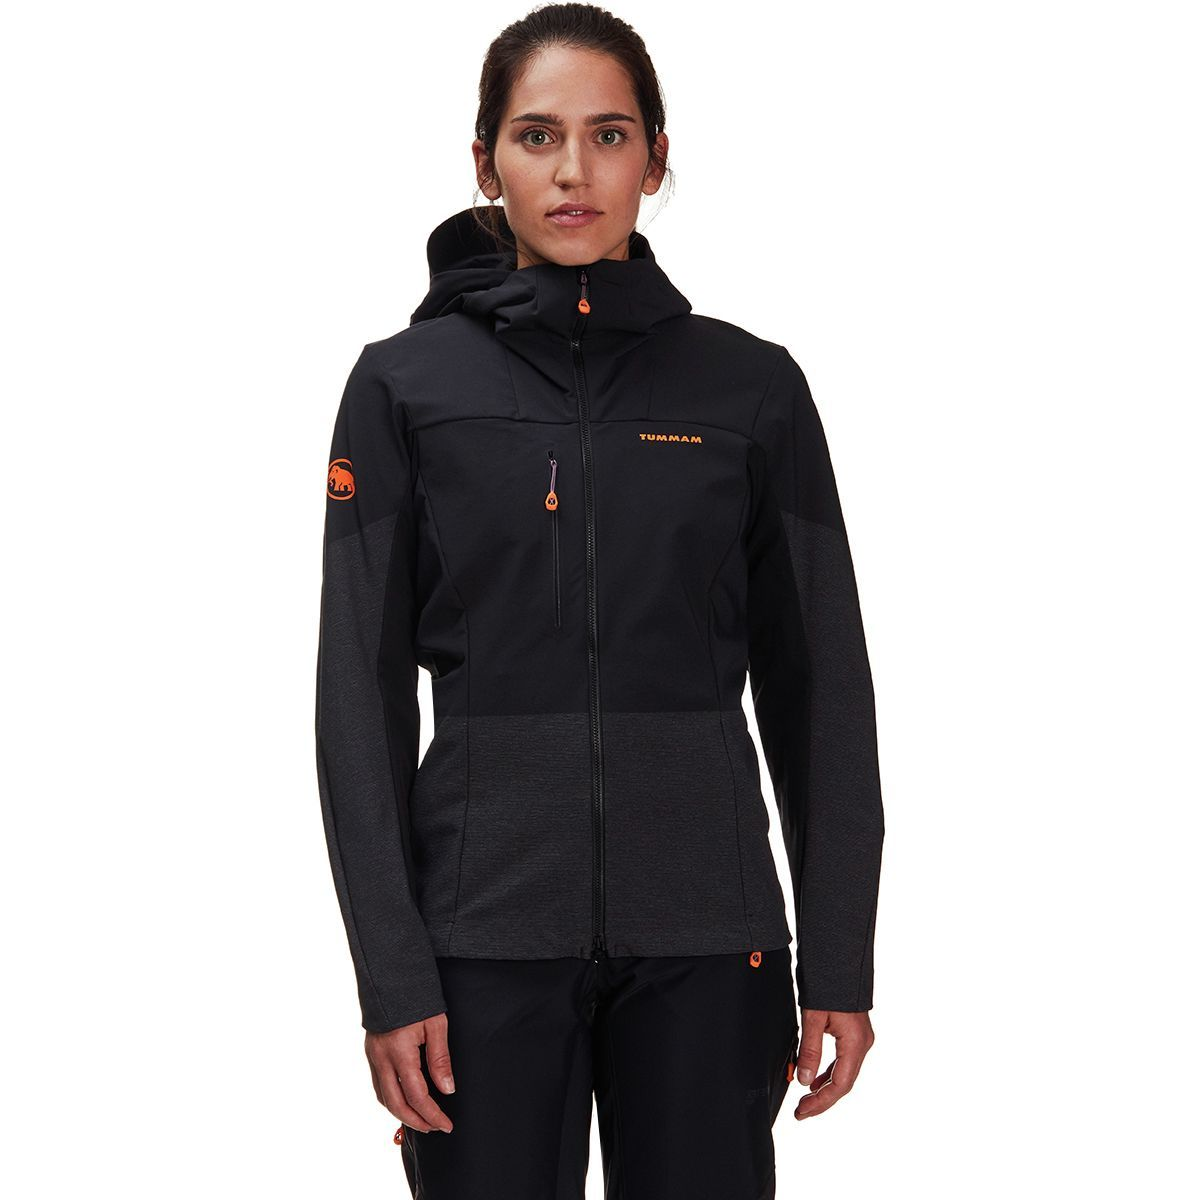 Mammut Eisfeld Light SO Hooded Softshell Jacket - Women's